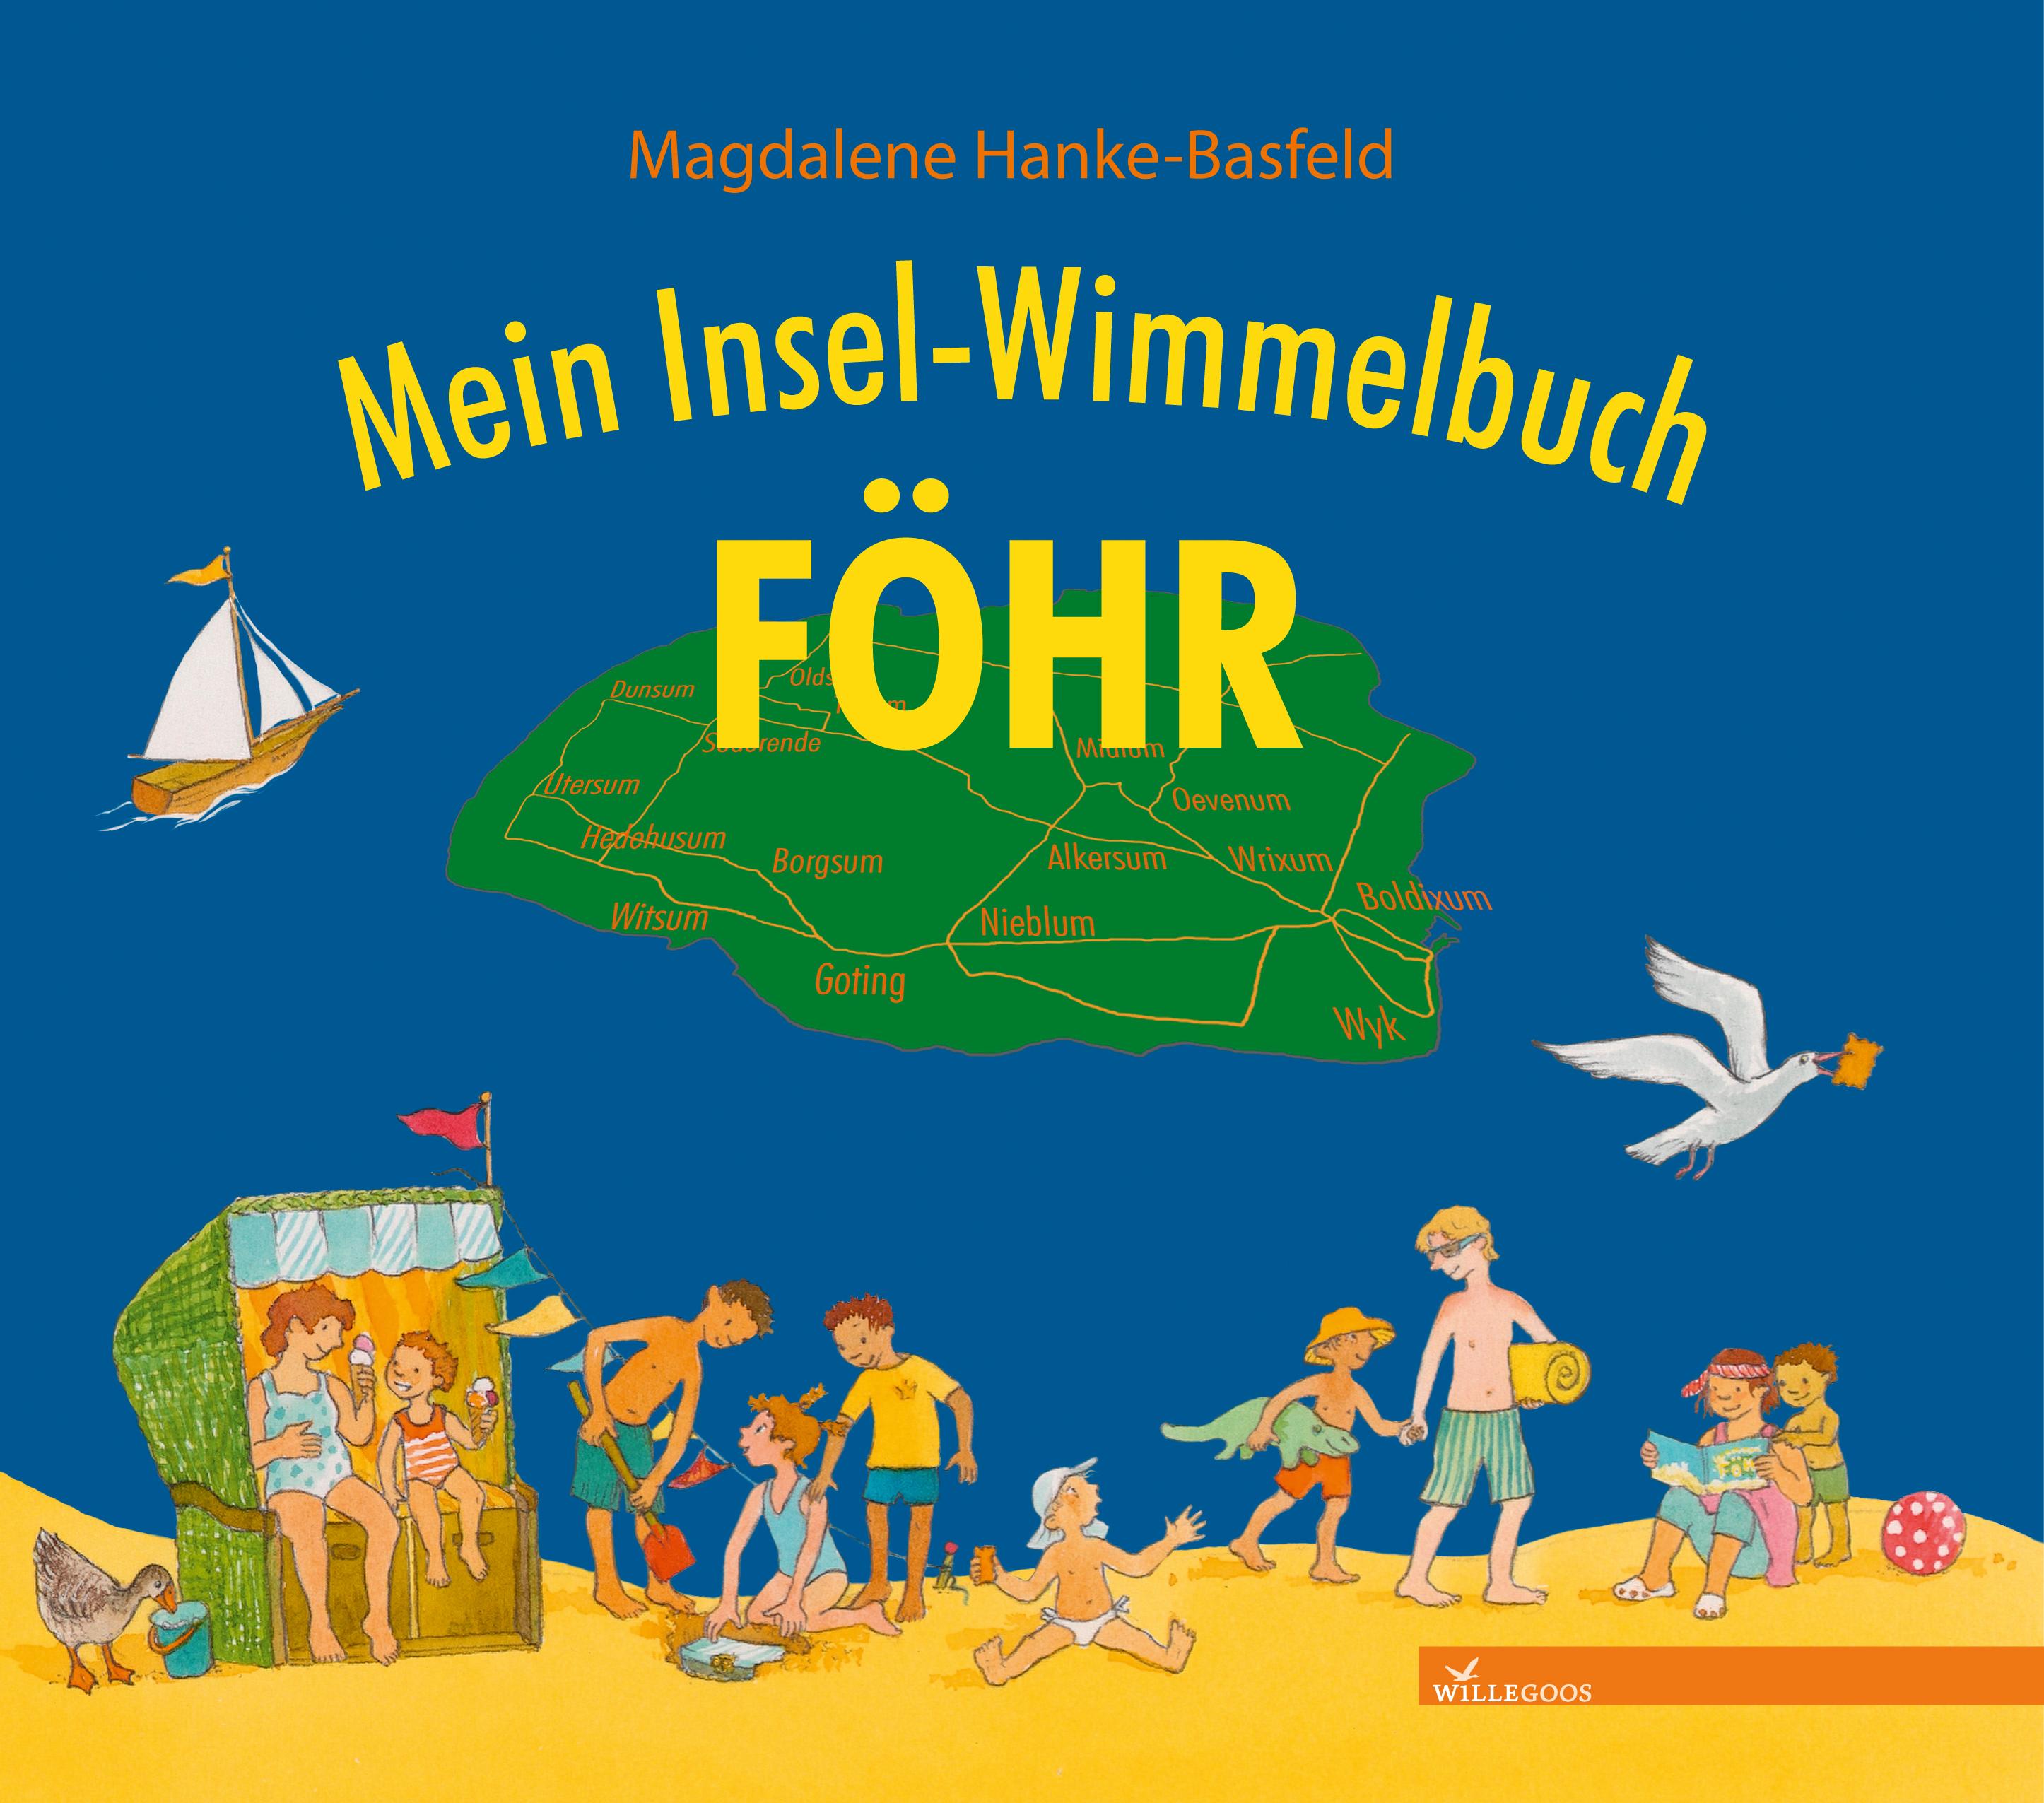 Mein Insel-Wimmelbuch Föhr - Magdalene Hanke-Basfeld (Illustration)